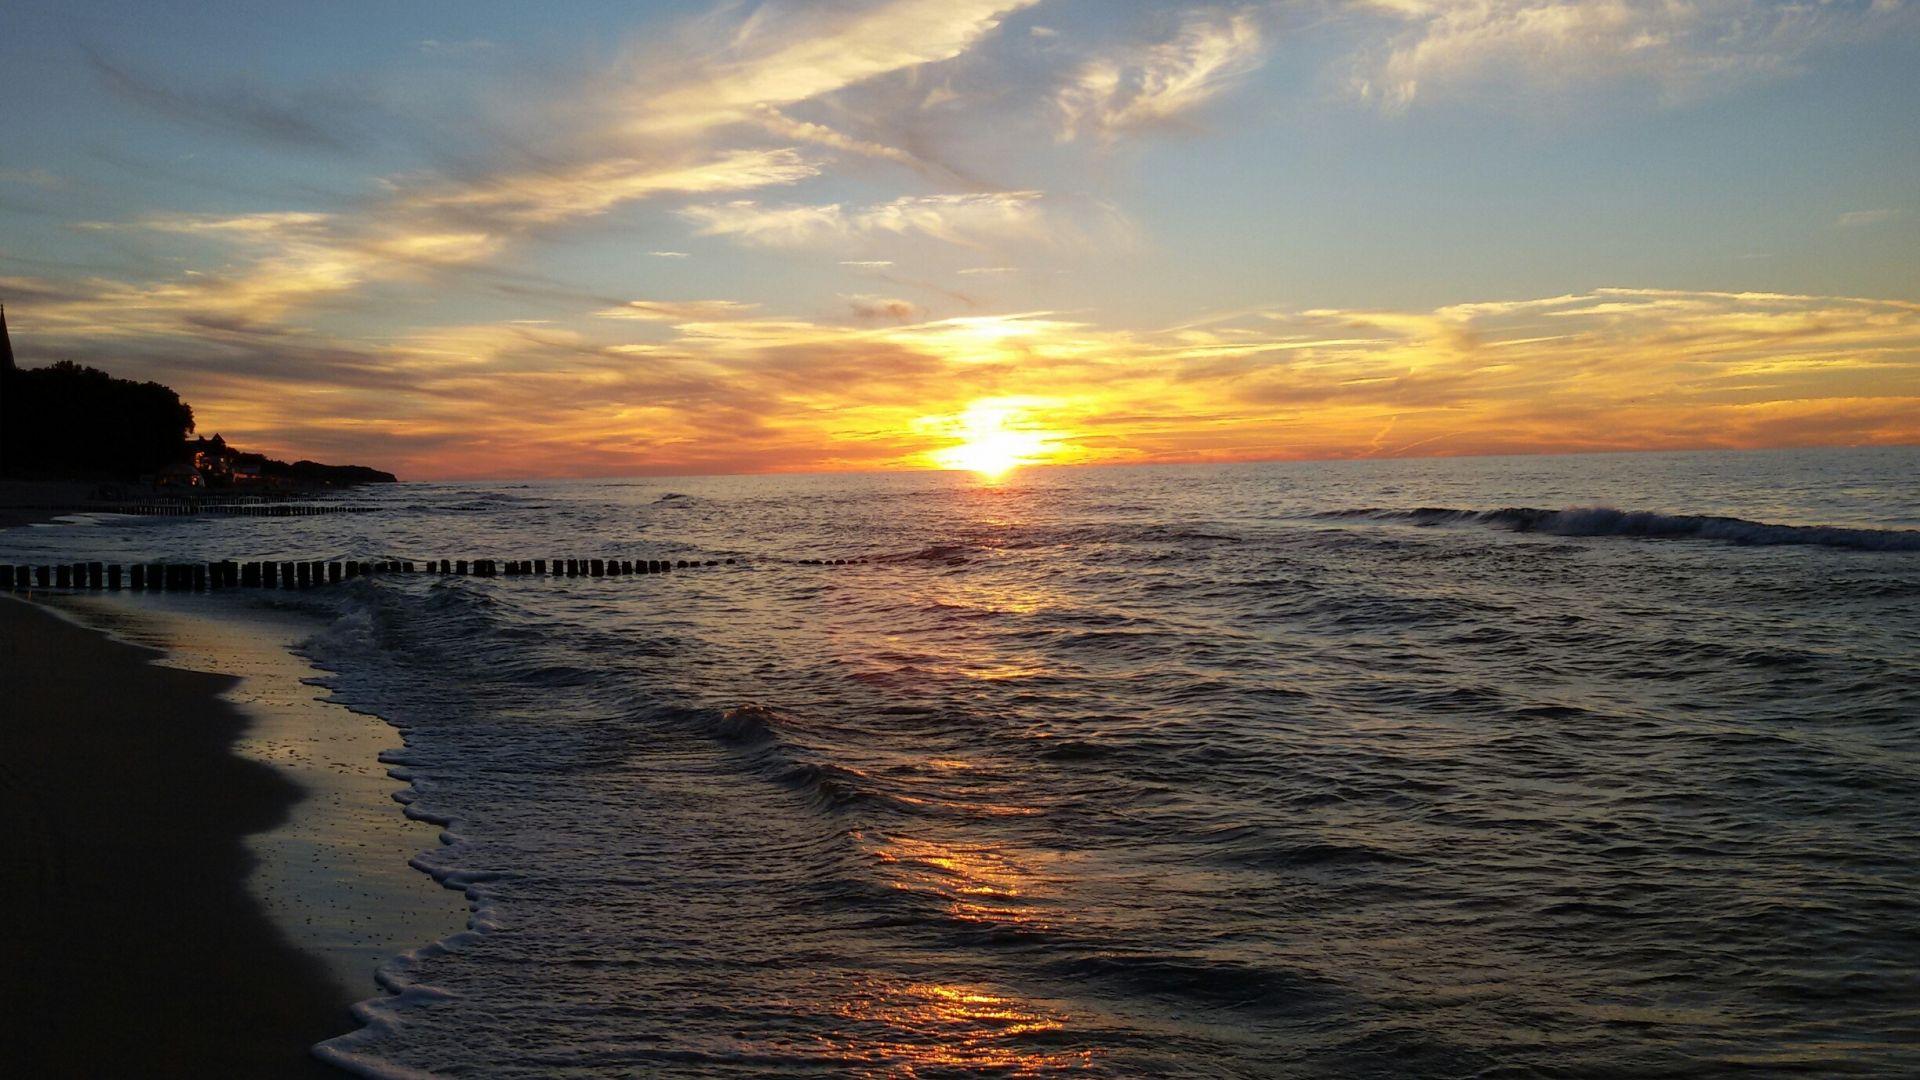 sunset sea nature wallpaper